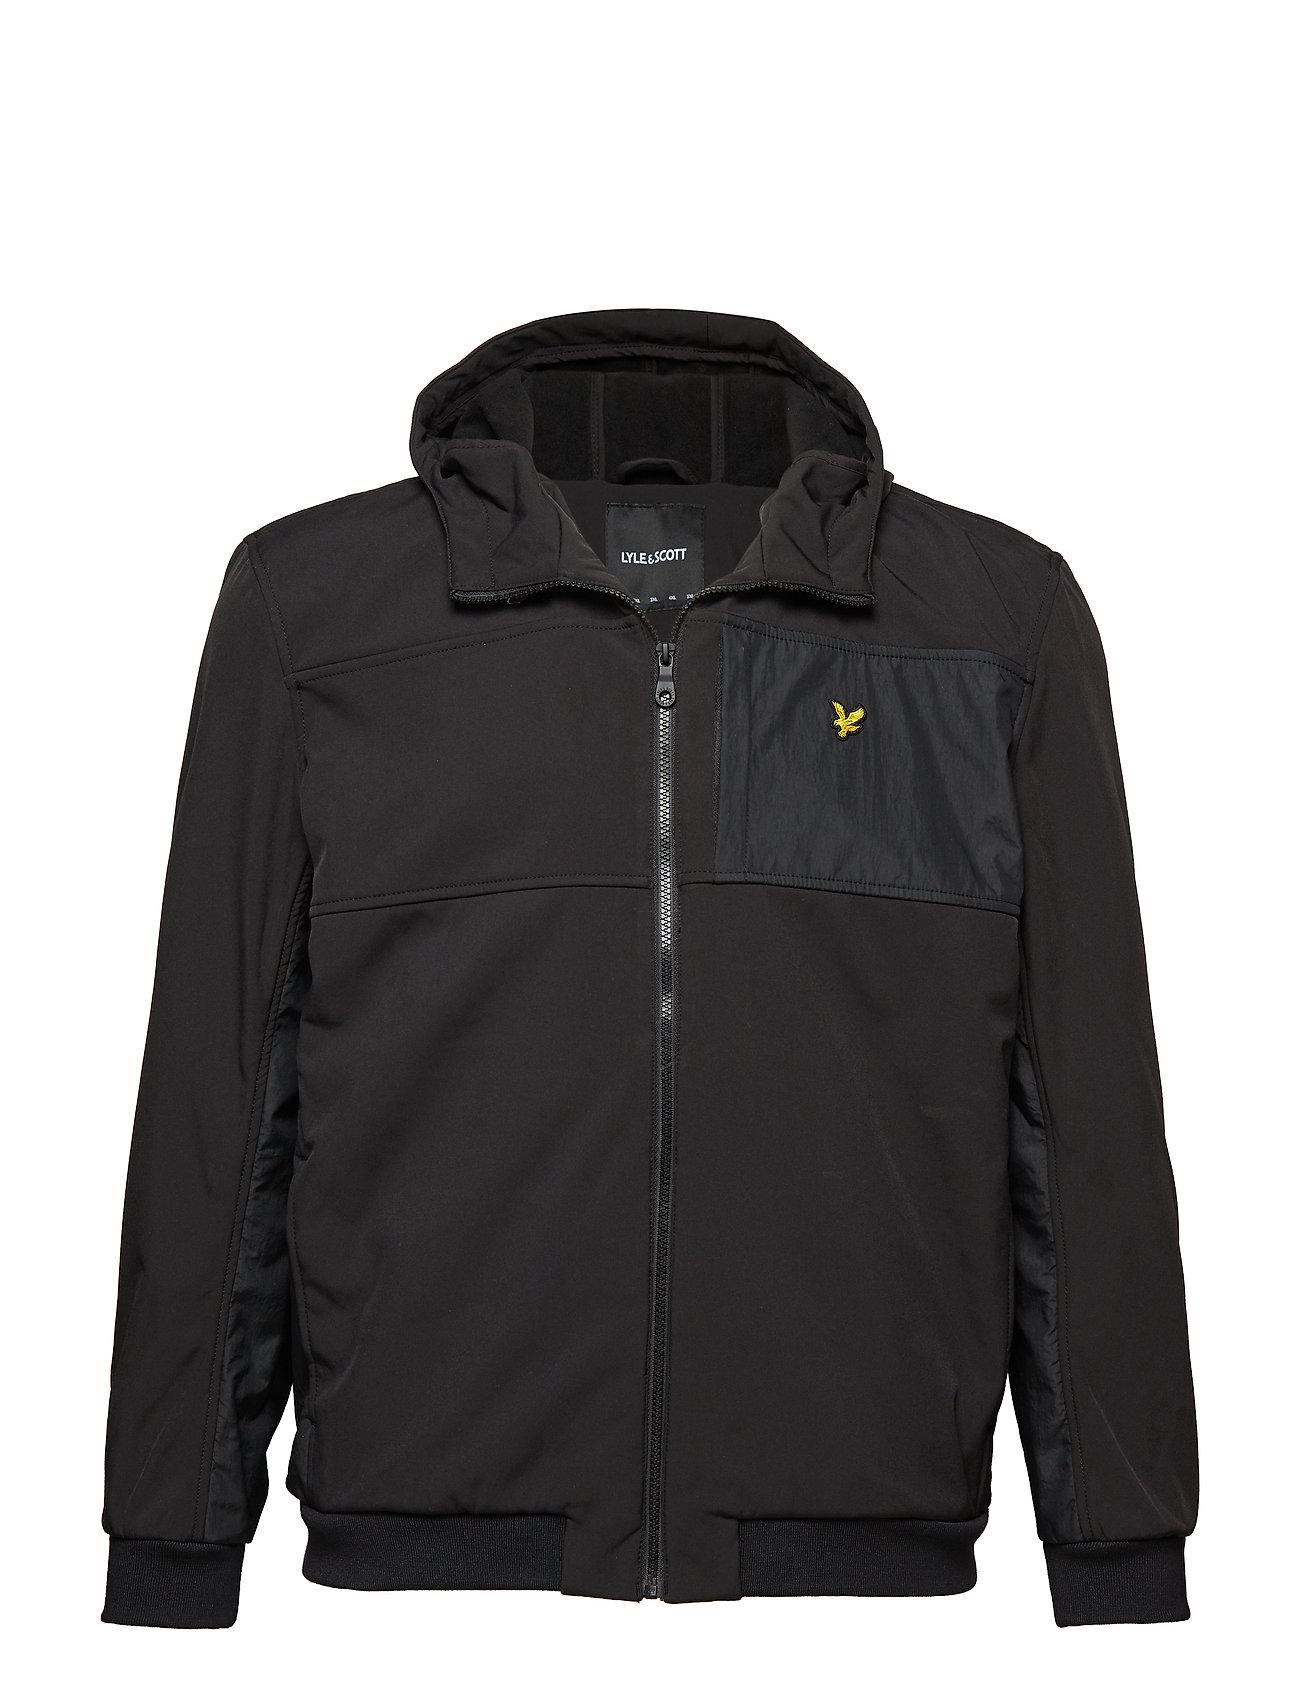 Lyle & Scott Softshell Jacket - TRUE BLACK